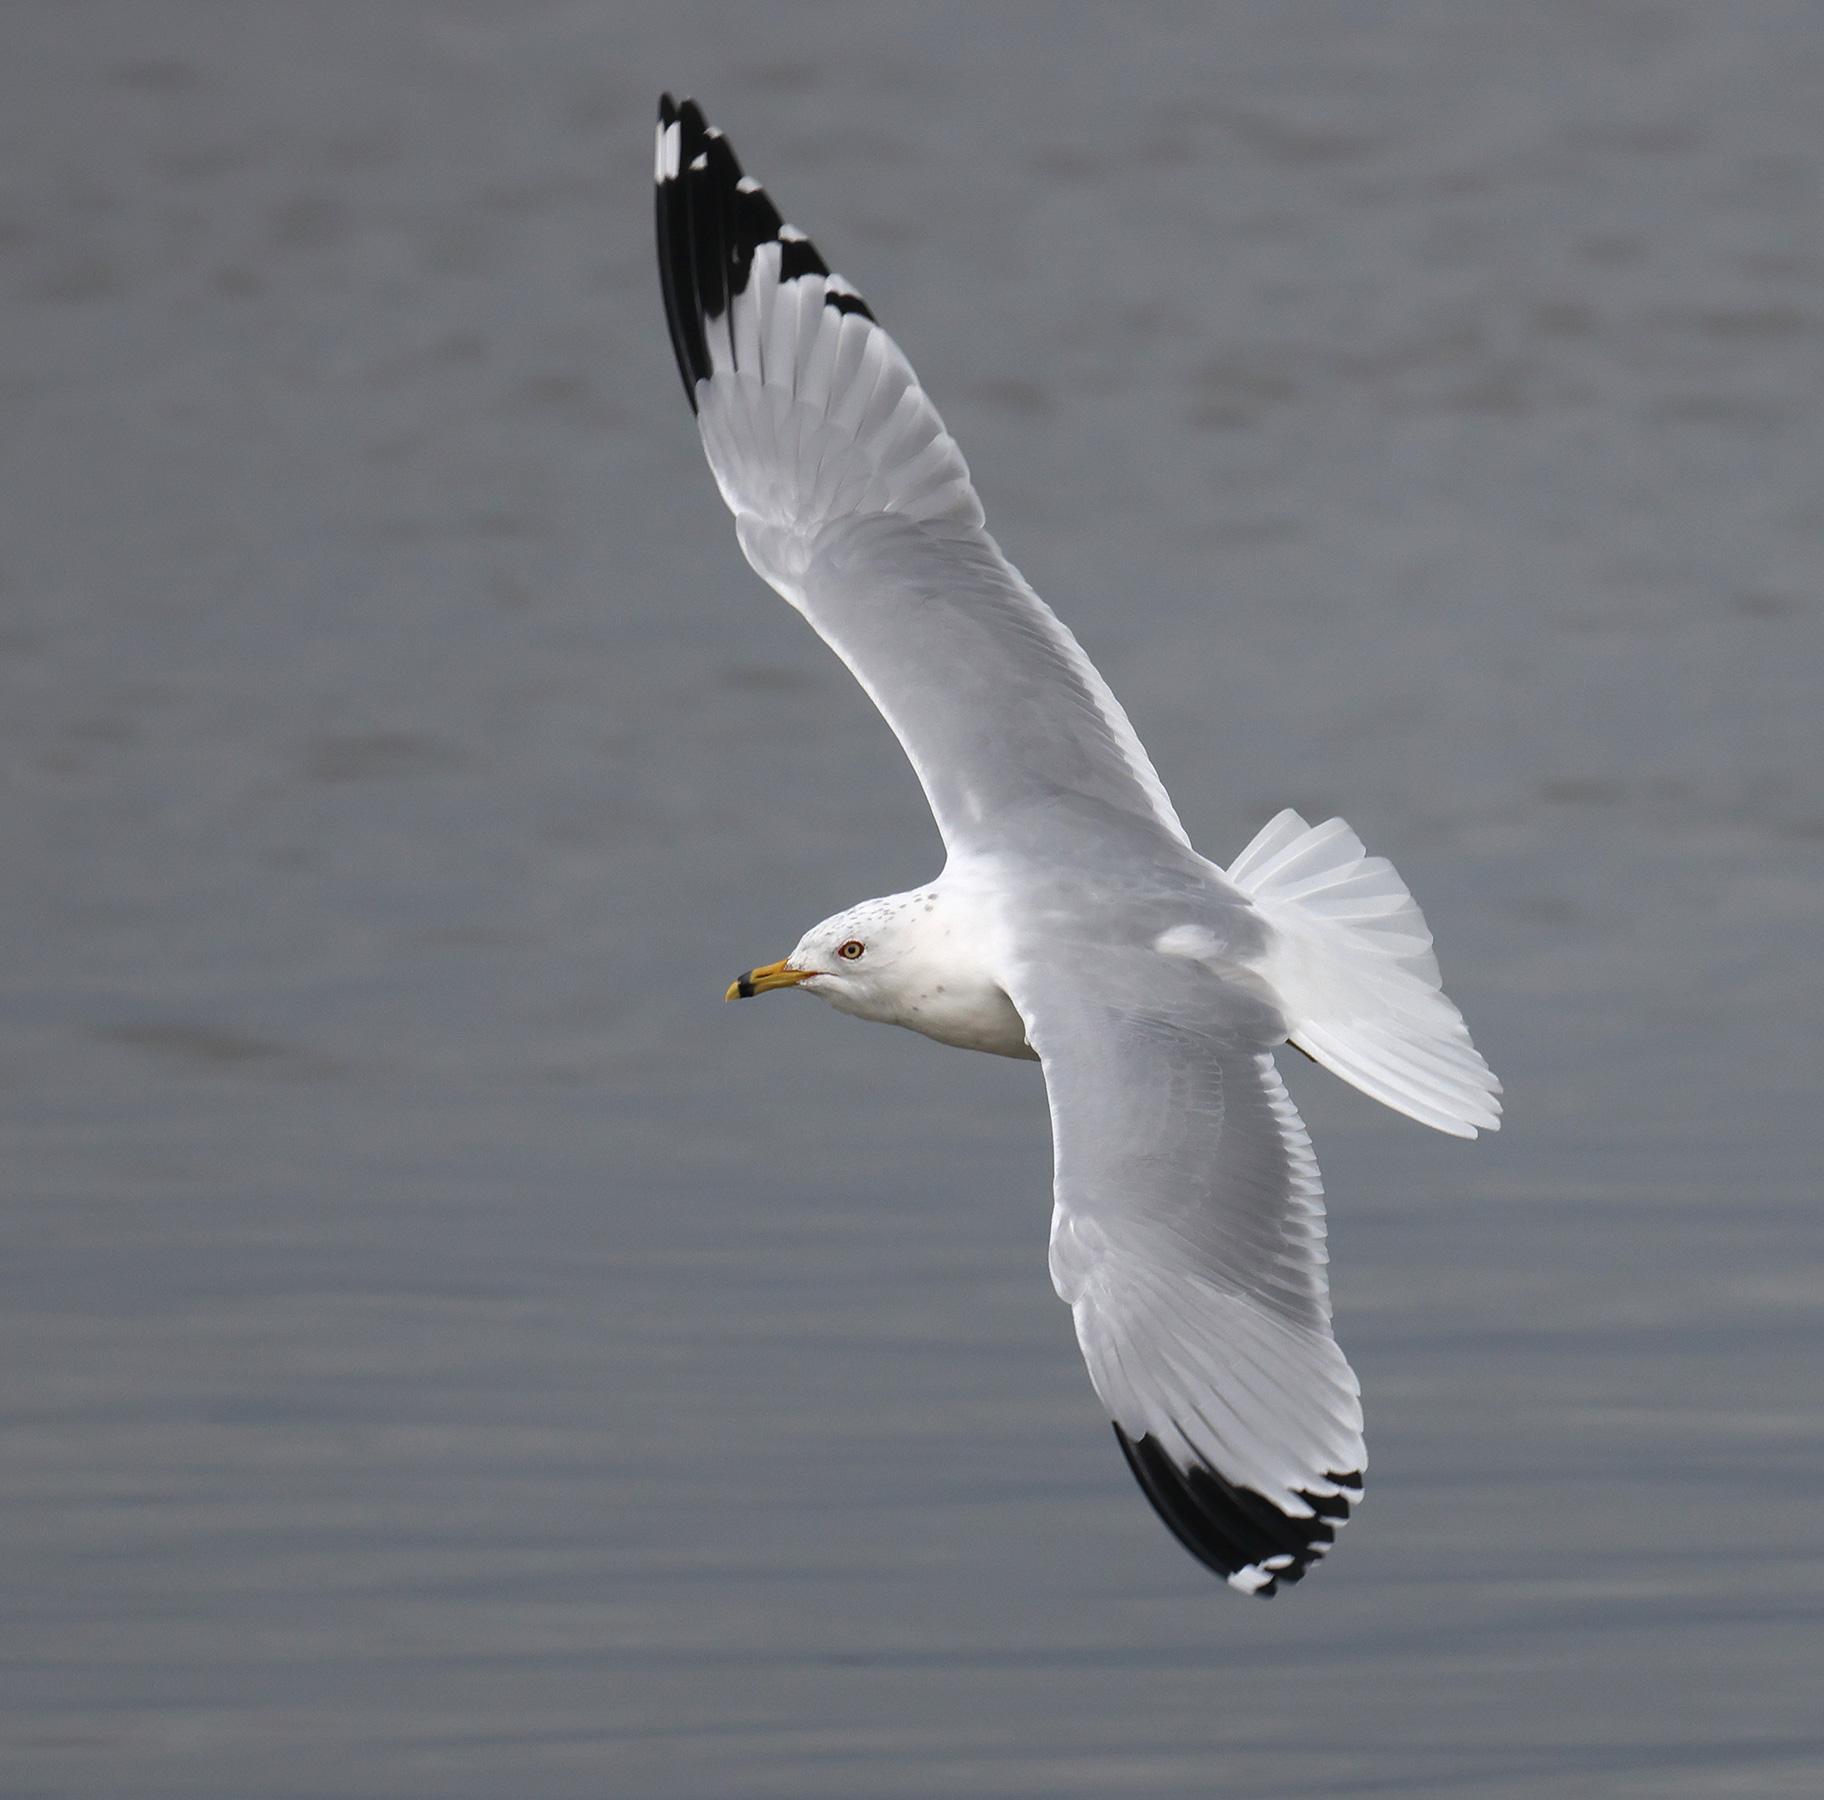 Ring-billed Gull, Co. Wexford, Ireland.